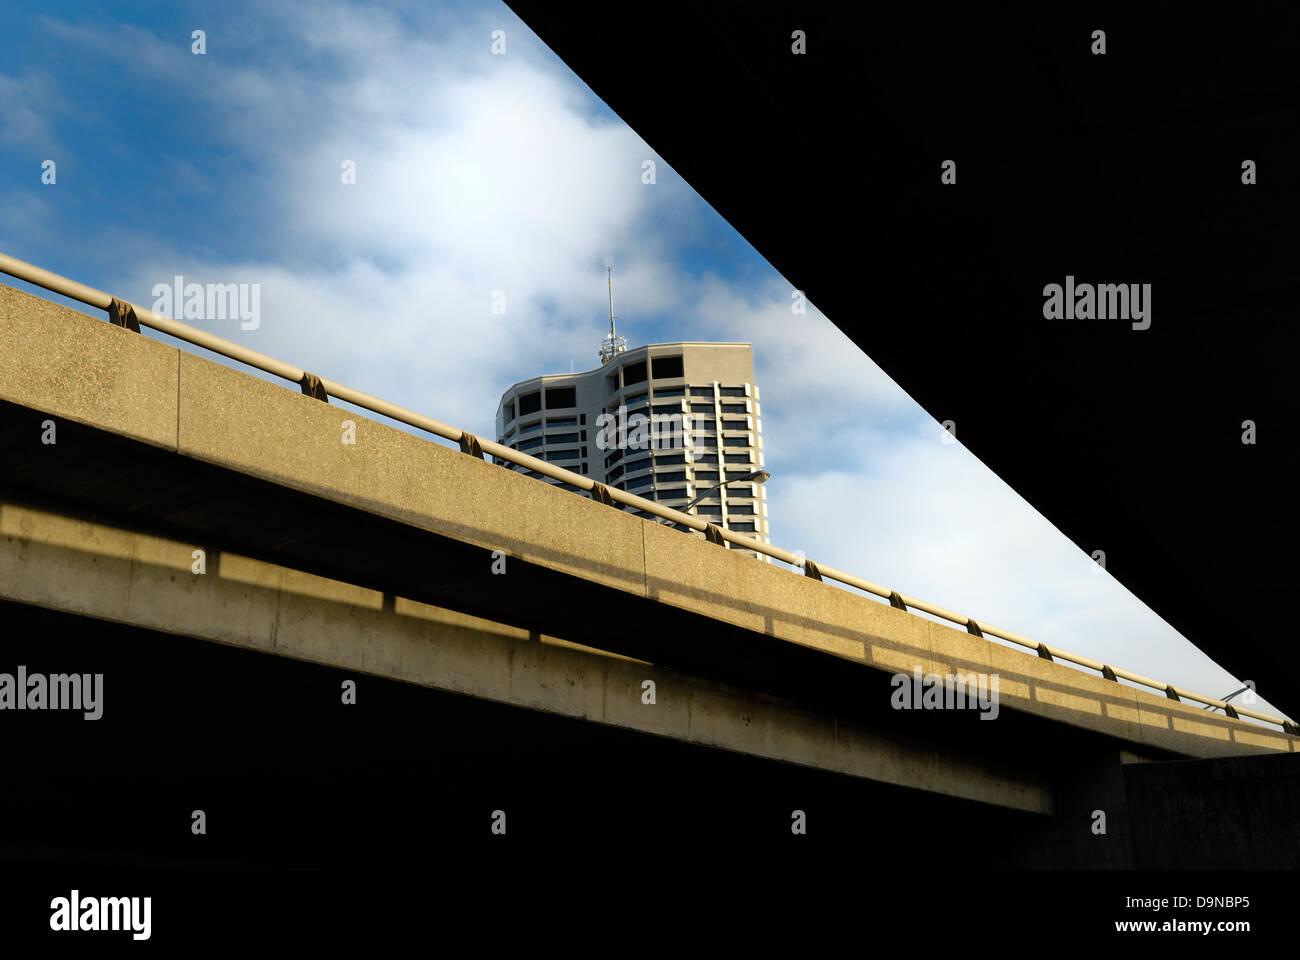 Building visible between freeway flyovers. Perth, Western Australia, Australia - Stock Image